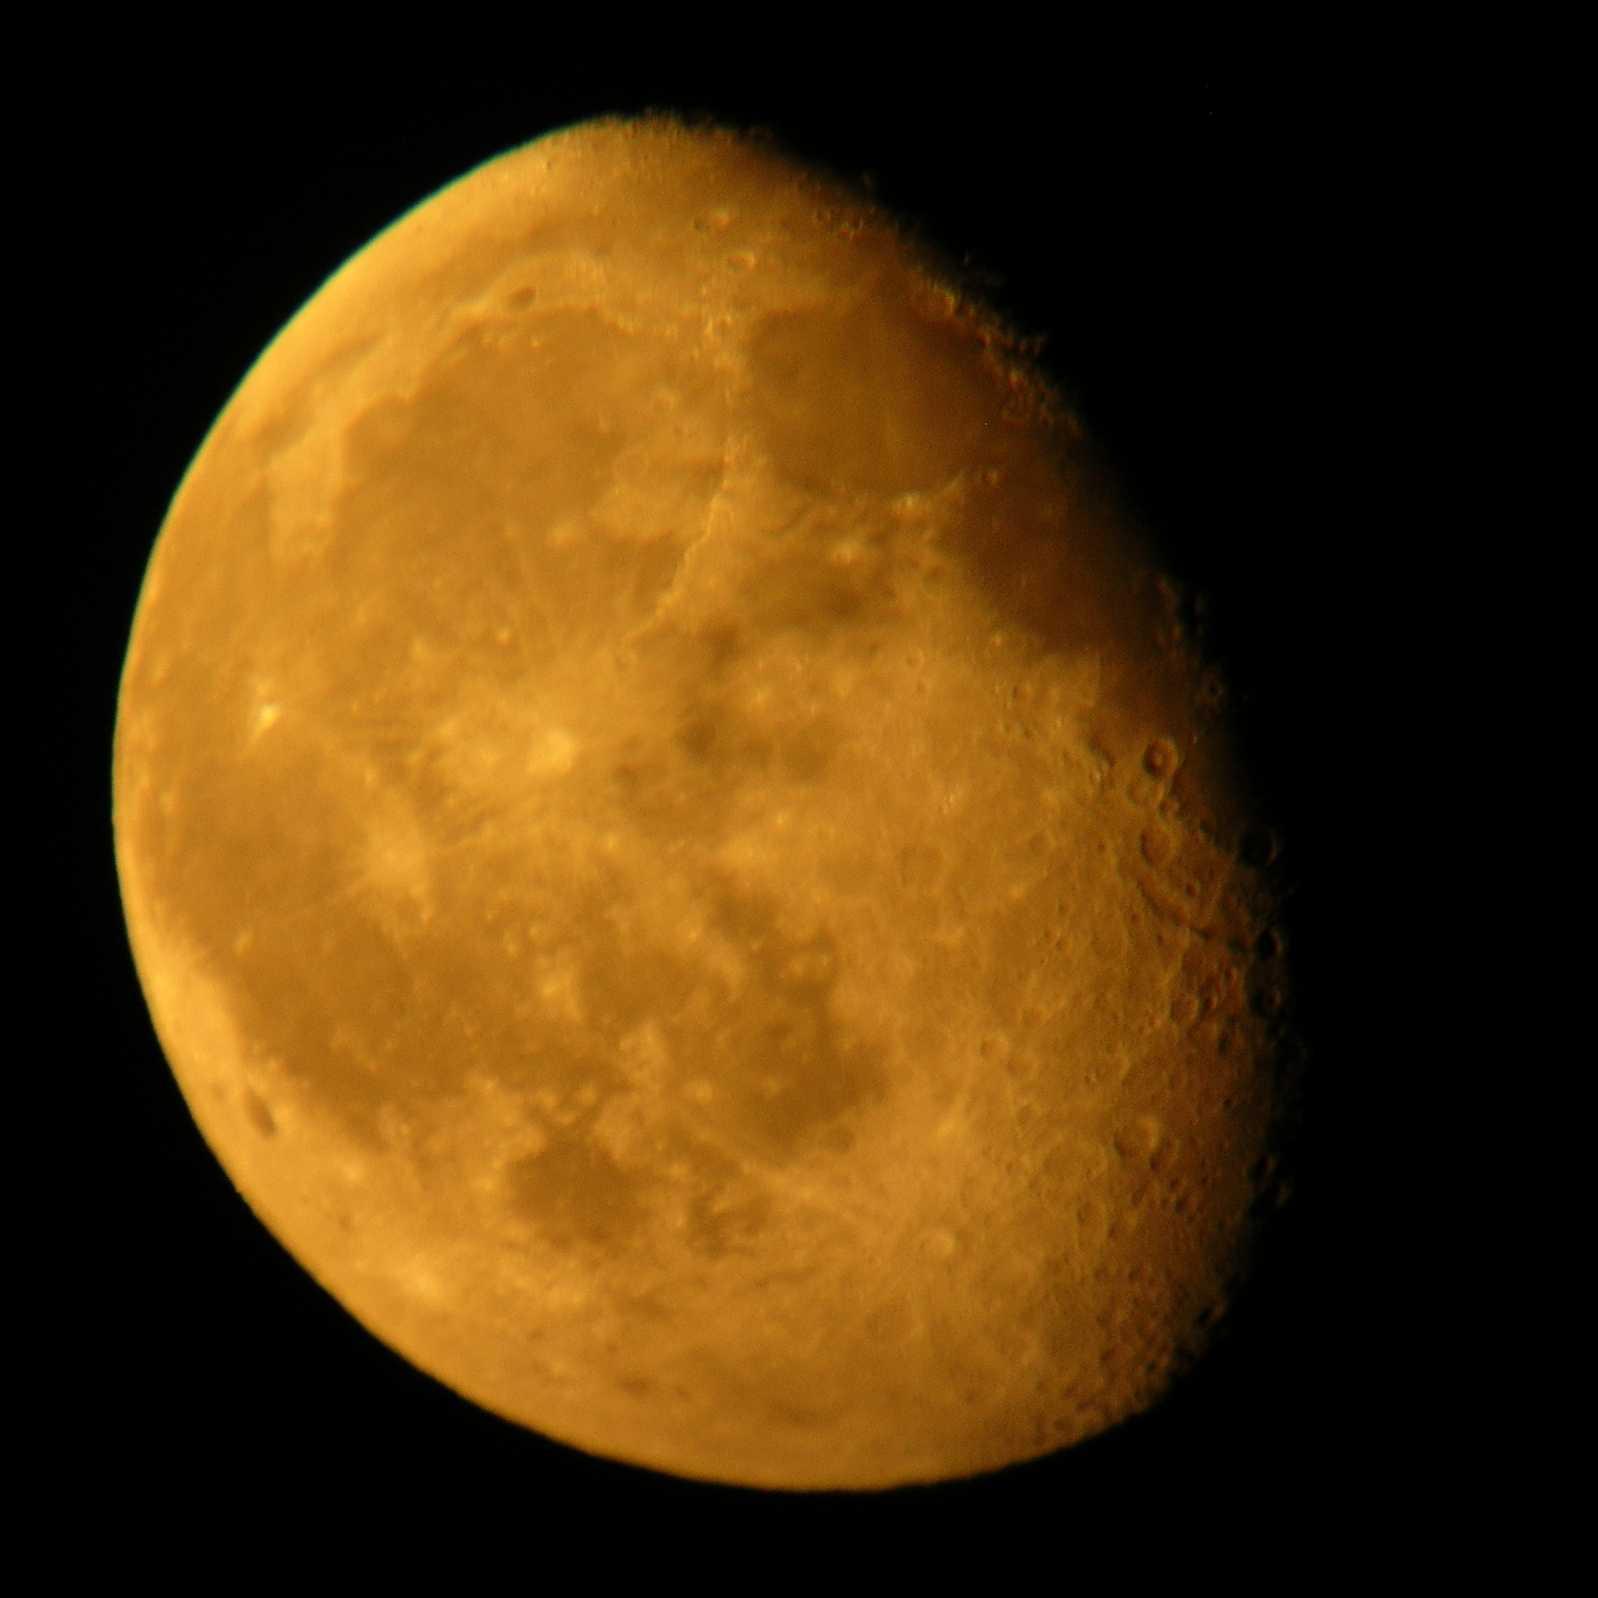 http://www-personal.umich.edu/~bbowman/photos/moon/the_Moon(60x)-080207-1156pm-orange.jpg